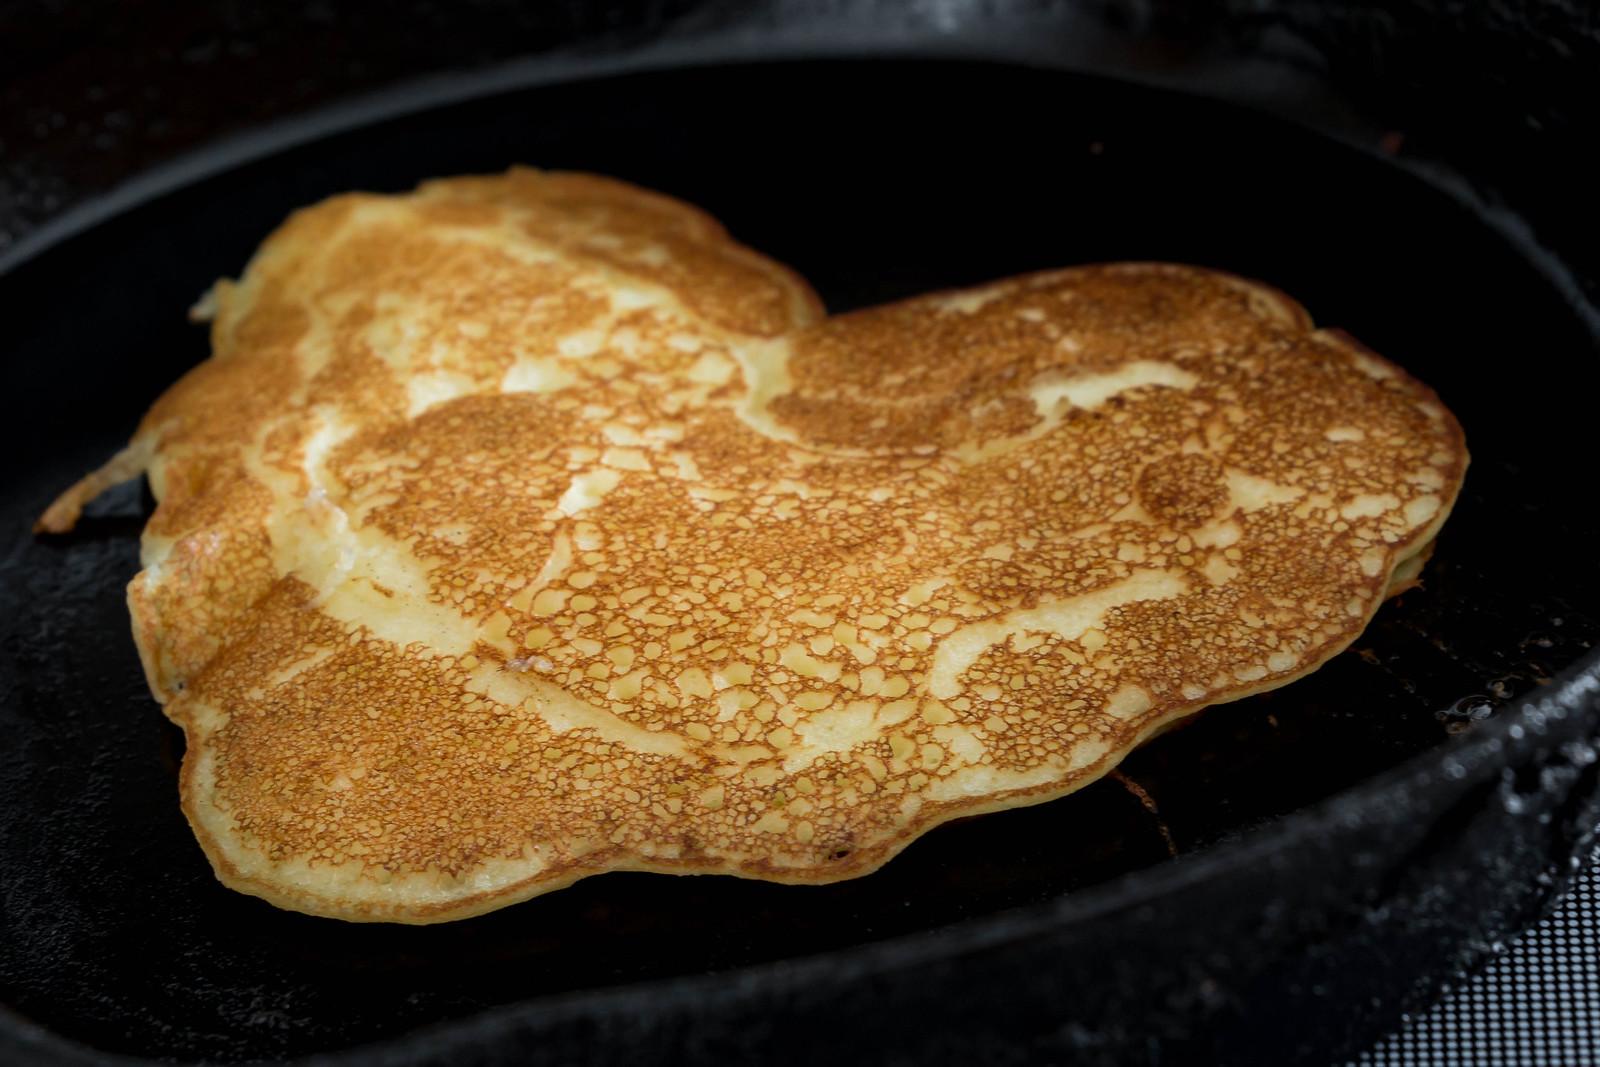 pancake tuesday/fat tuesday/shrove tuesday